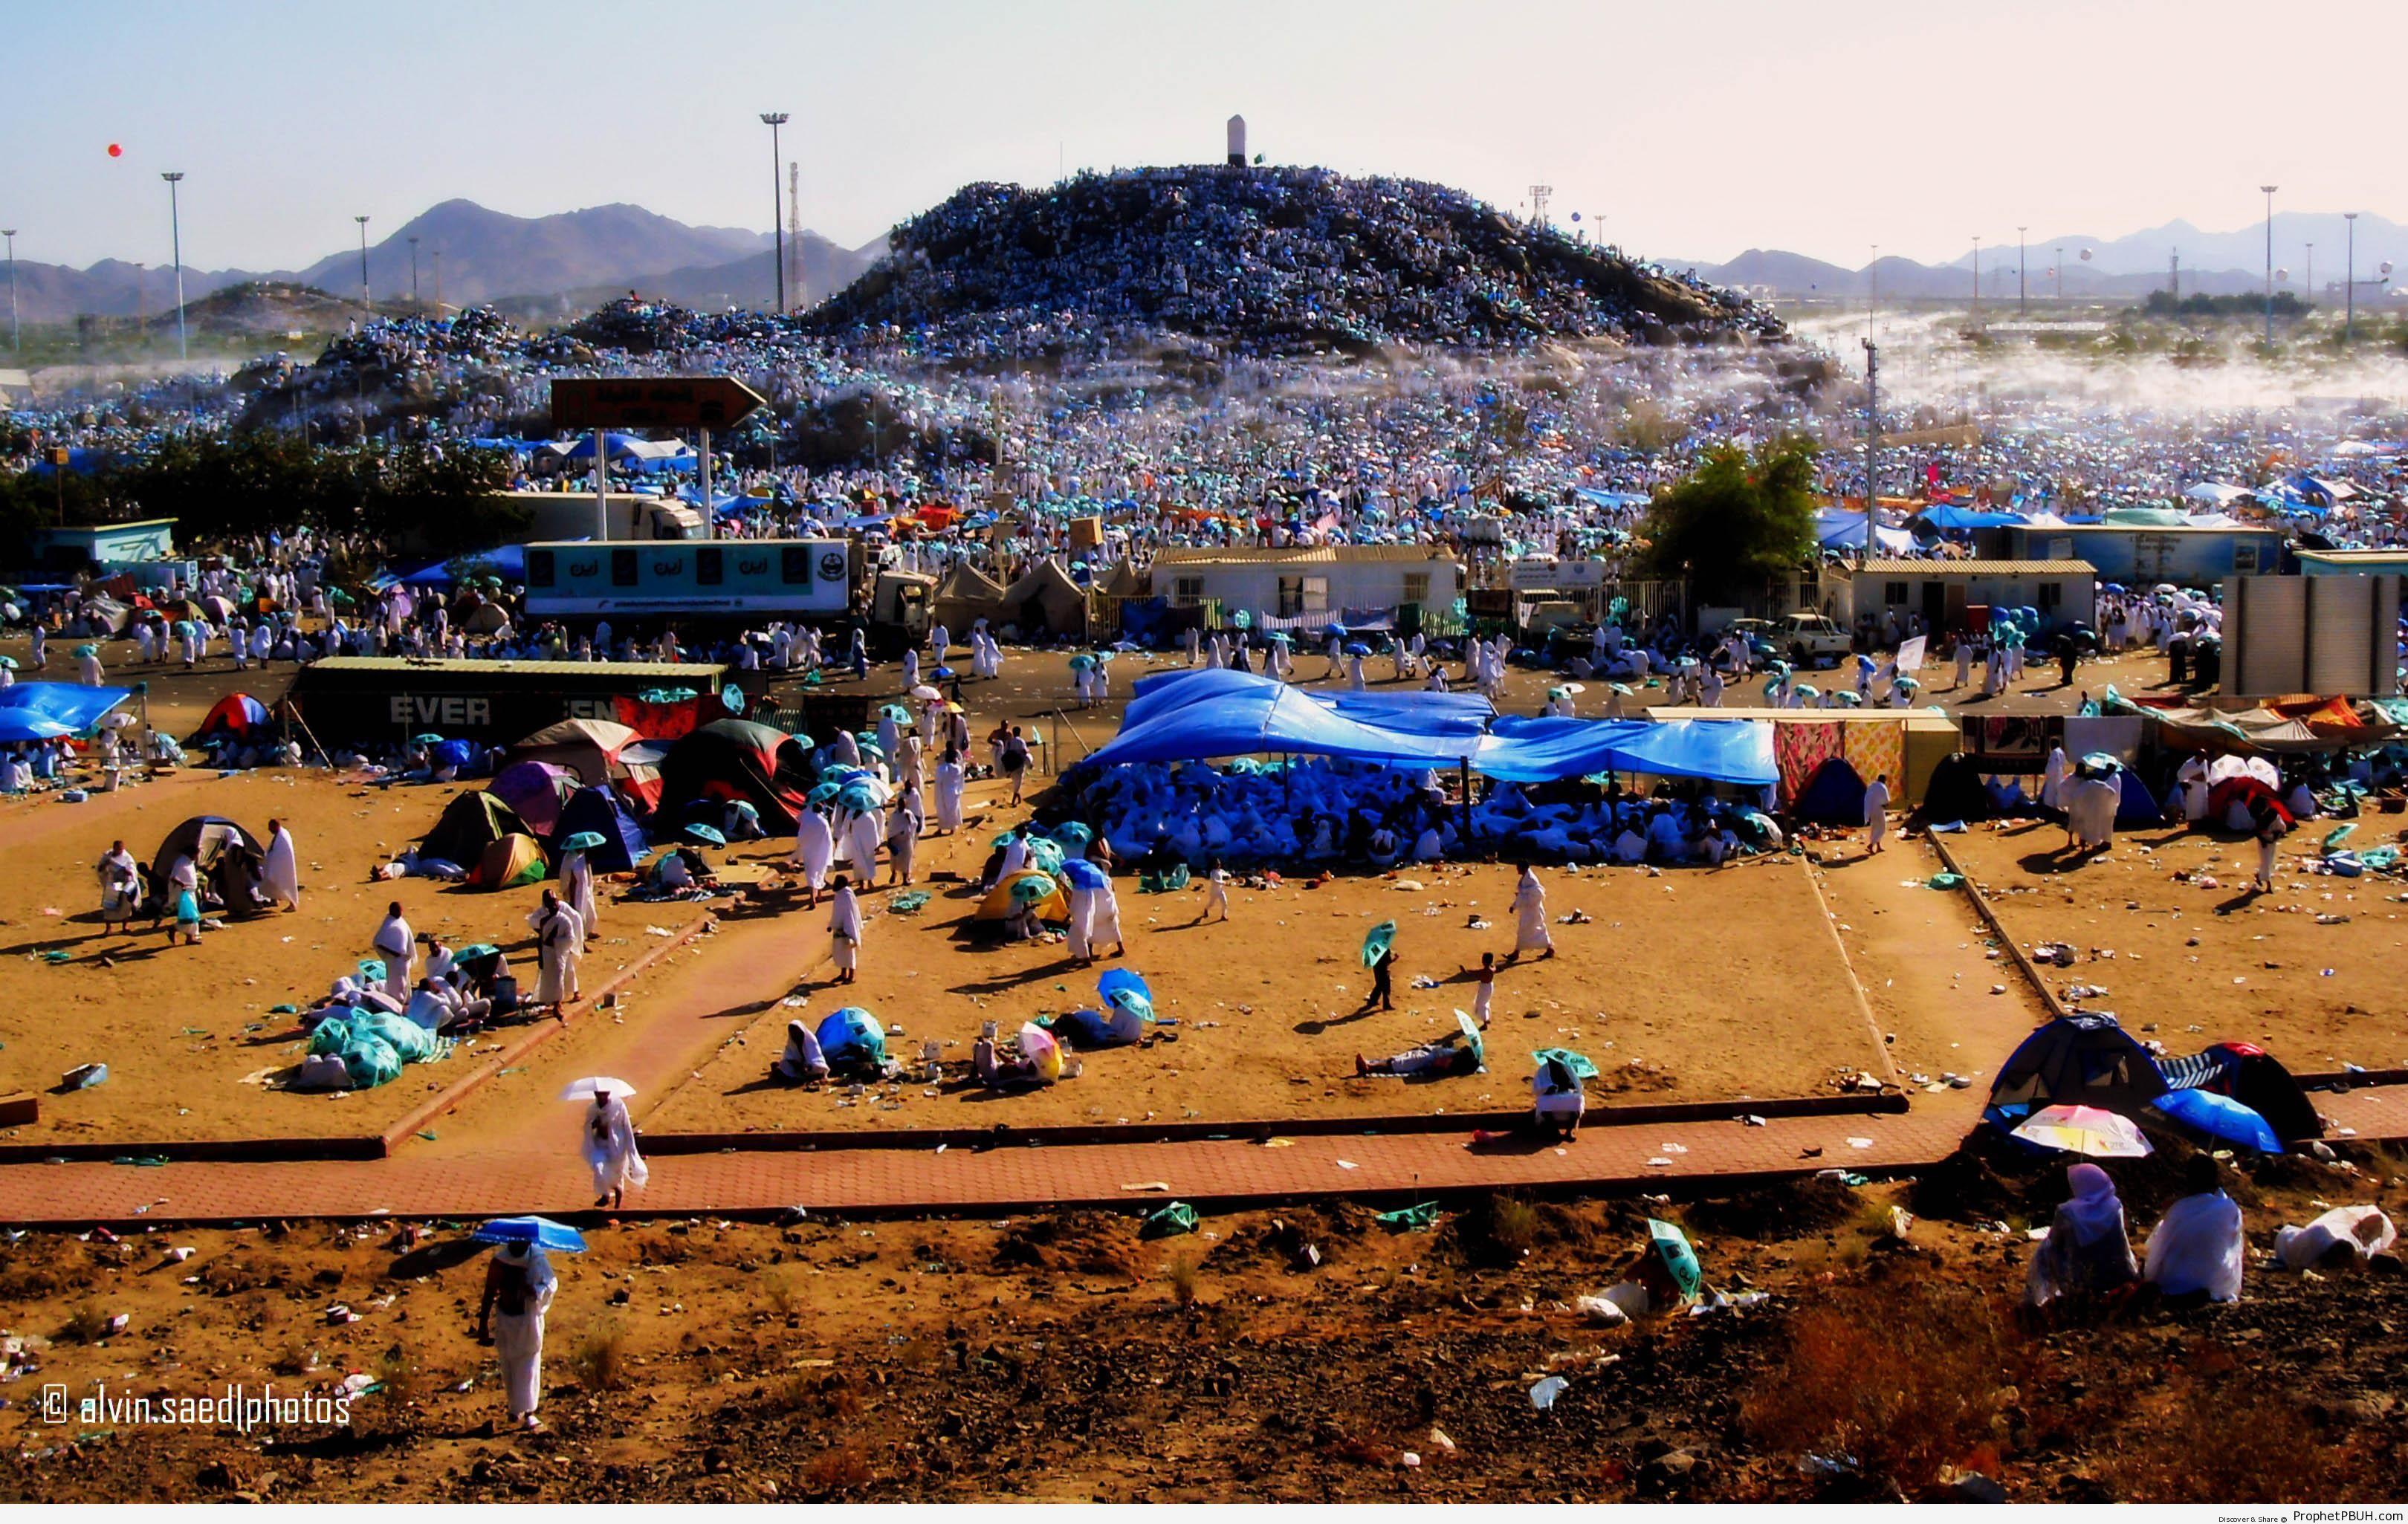 View of Pilgrims on Mount Arafat at Haj Time - Artist- Alvin A. Saed -